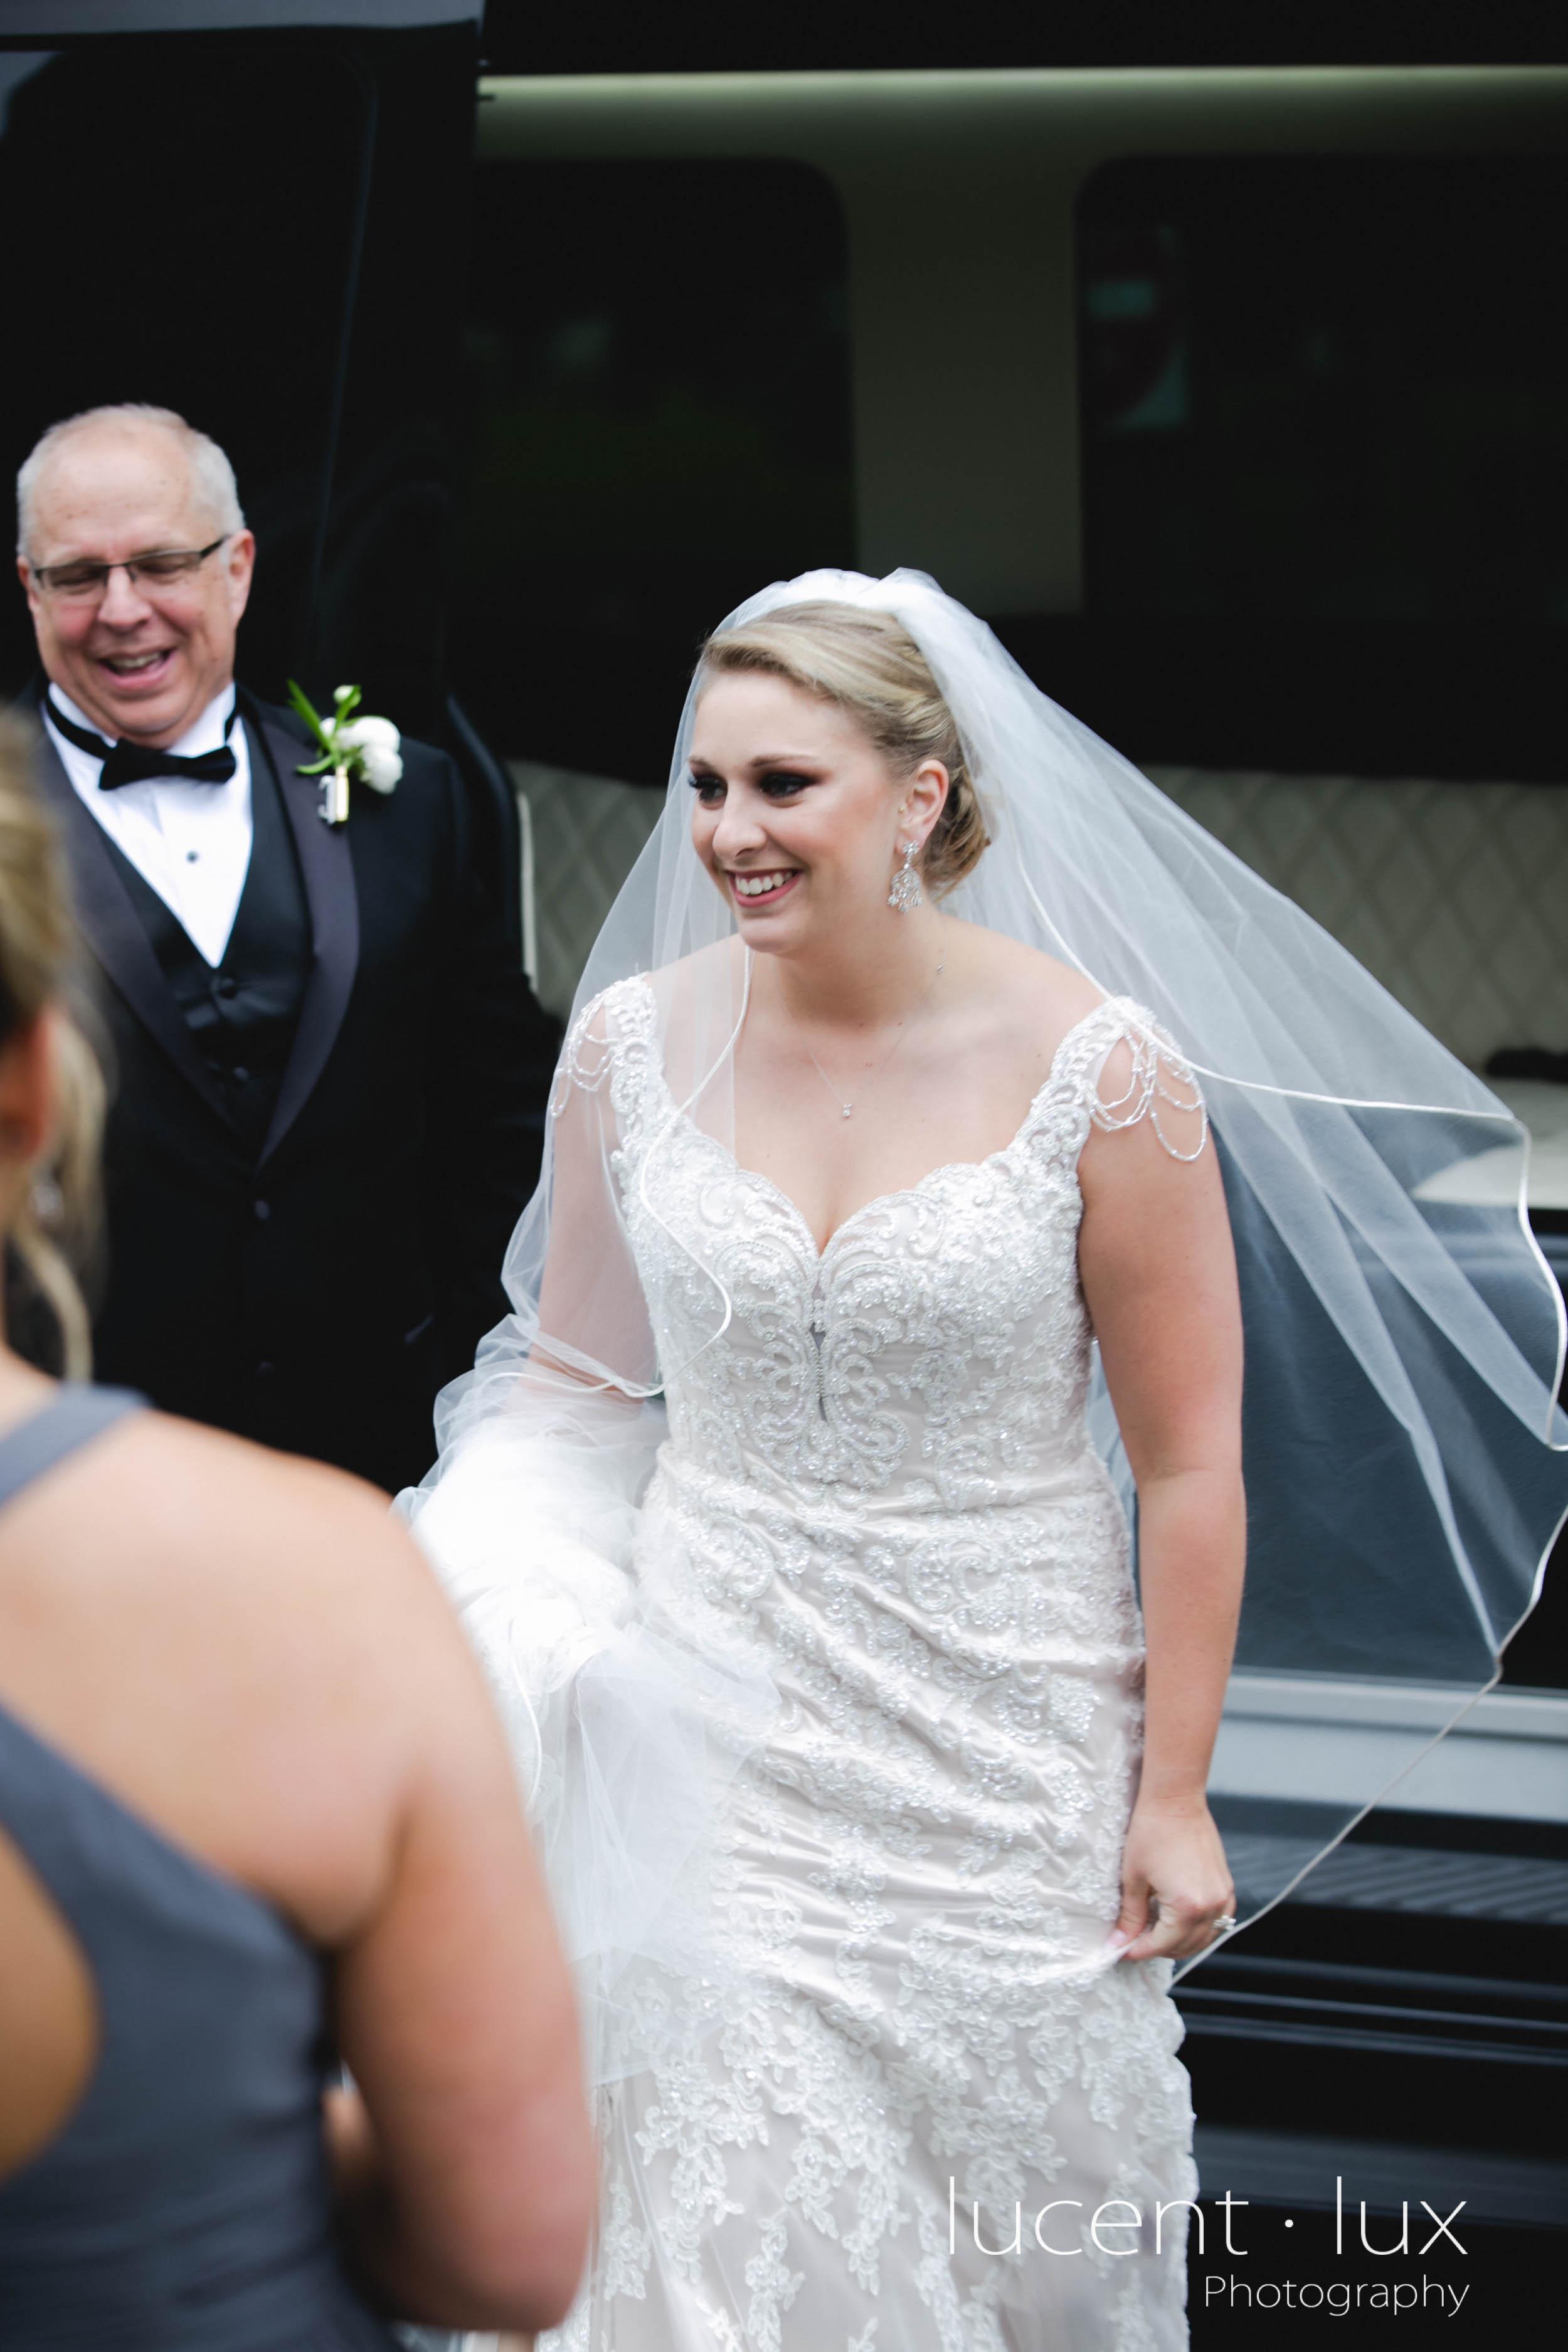 Wedding-Photography-Maryland-Pennsylvania-Photographer-Mendenhall-Inn-Media-Portrait-Event-113.jpg